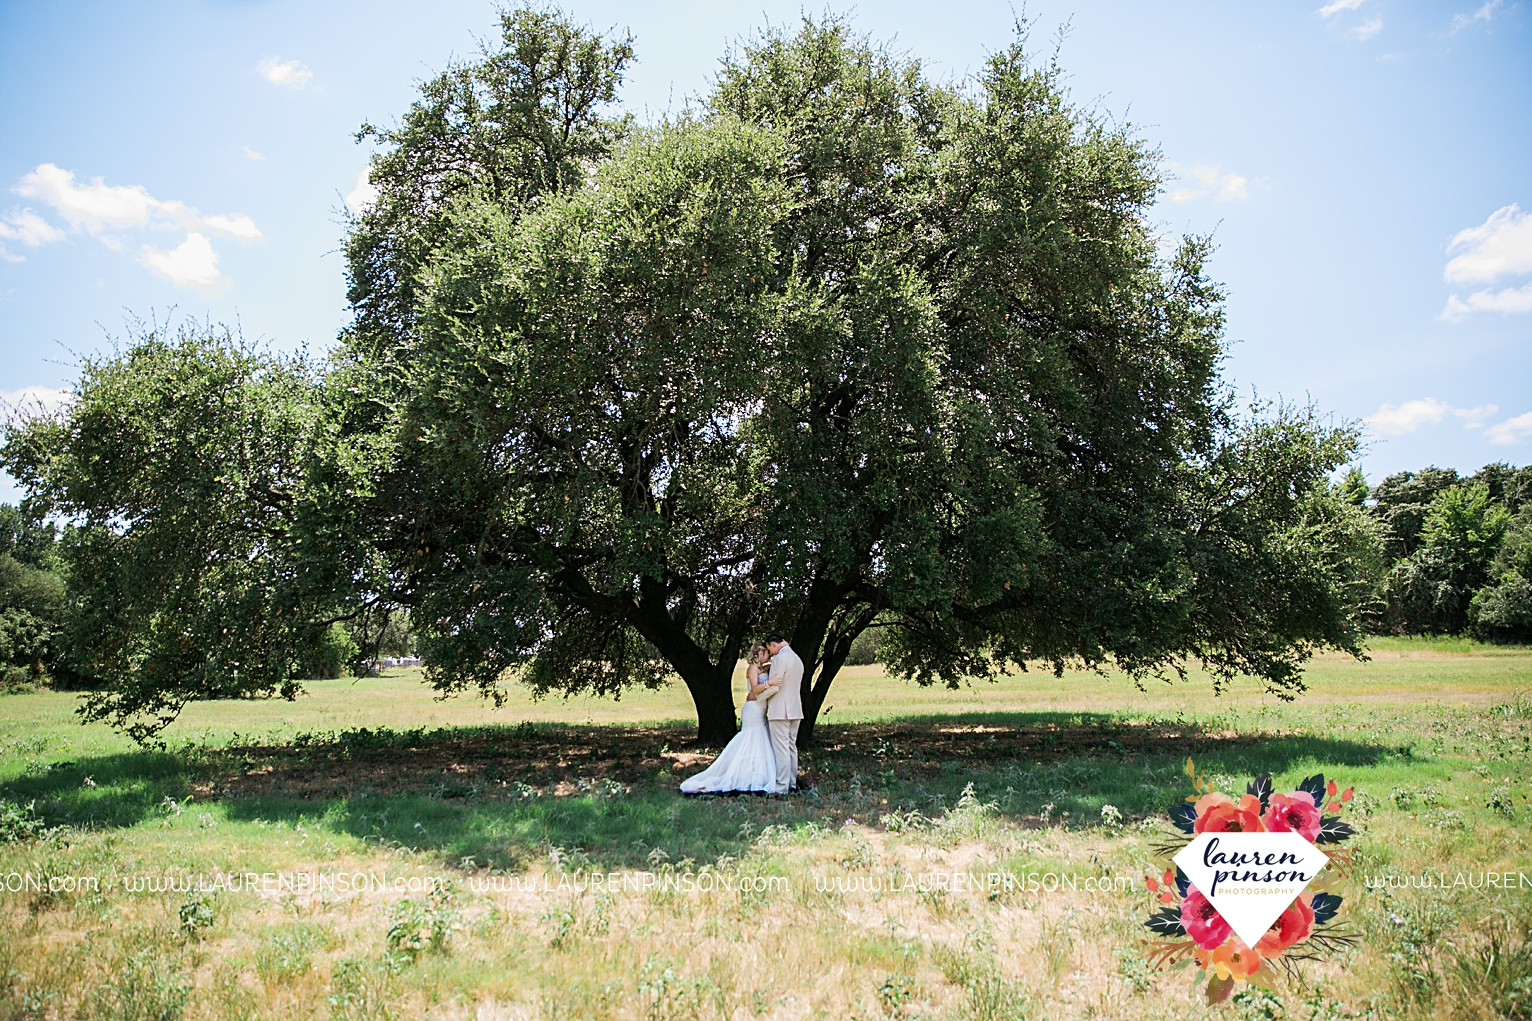 weatherford-texas-hollow-hill-farm-event-wedding-mineral-wells-dfw-wedding-photographer-wichita-falls-photography_3135.jpg